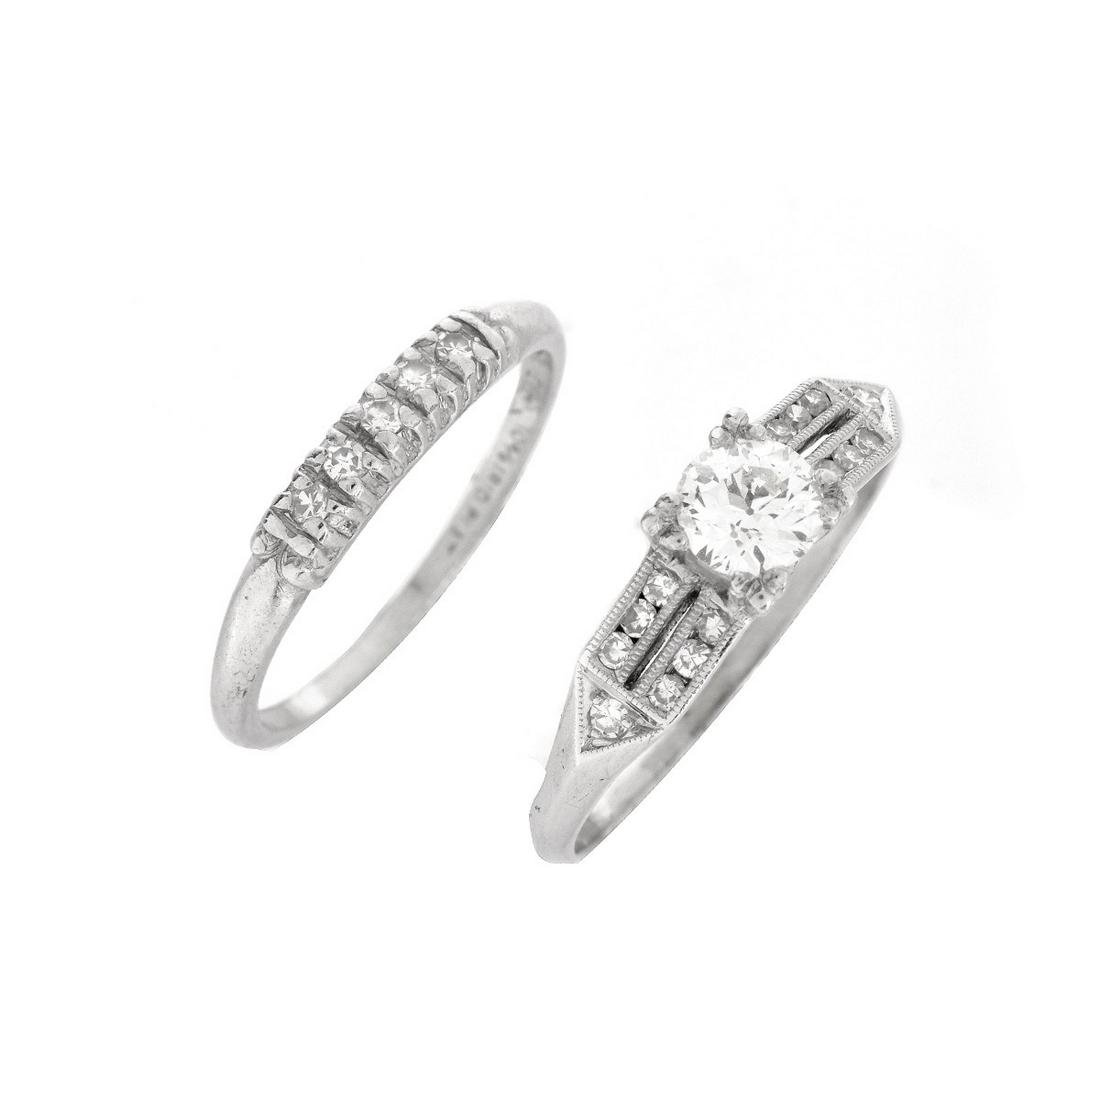 Art Deco Diamond and Platinum Ring Set